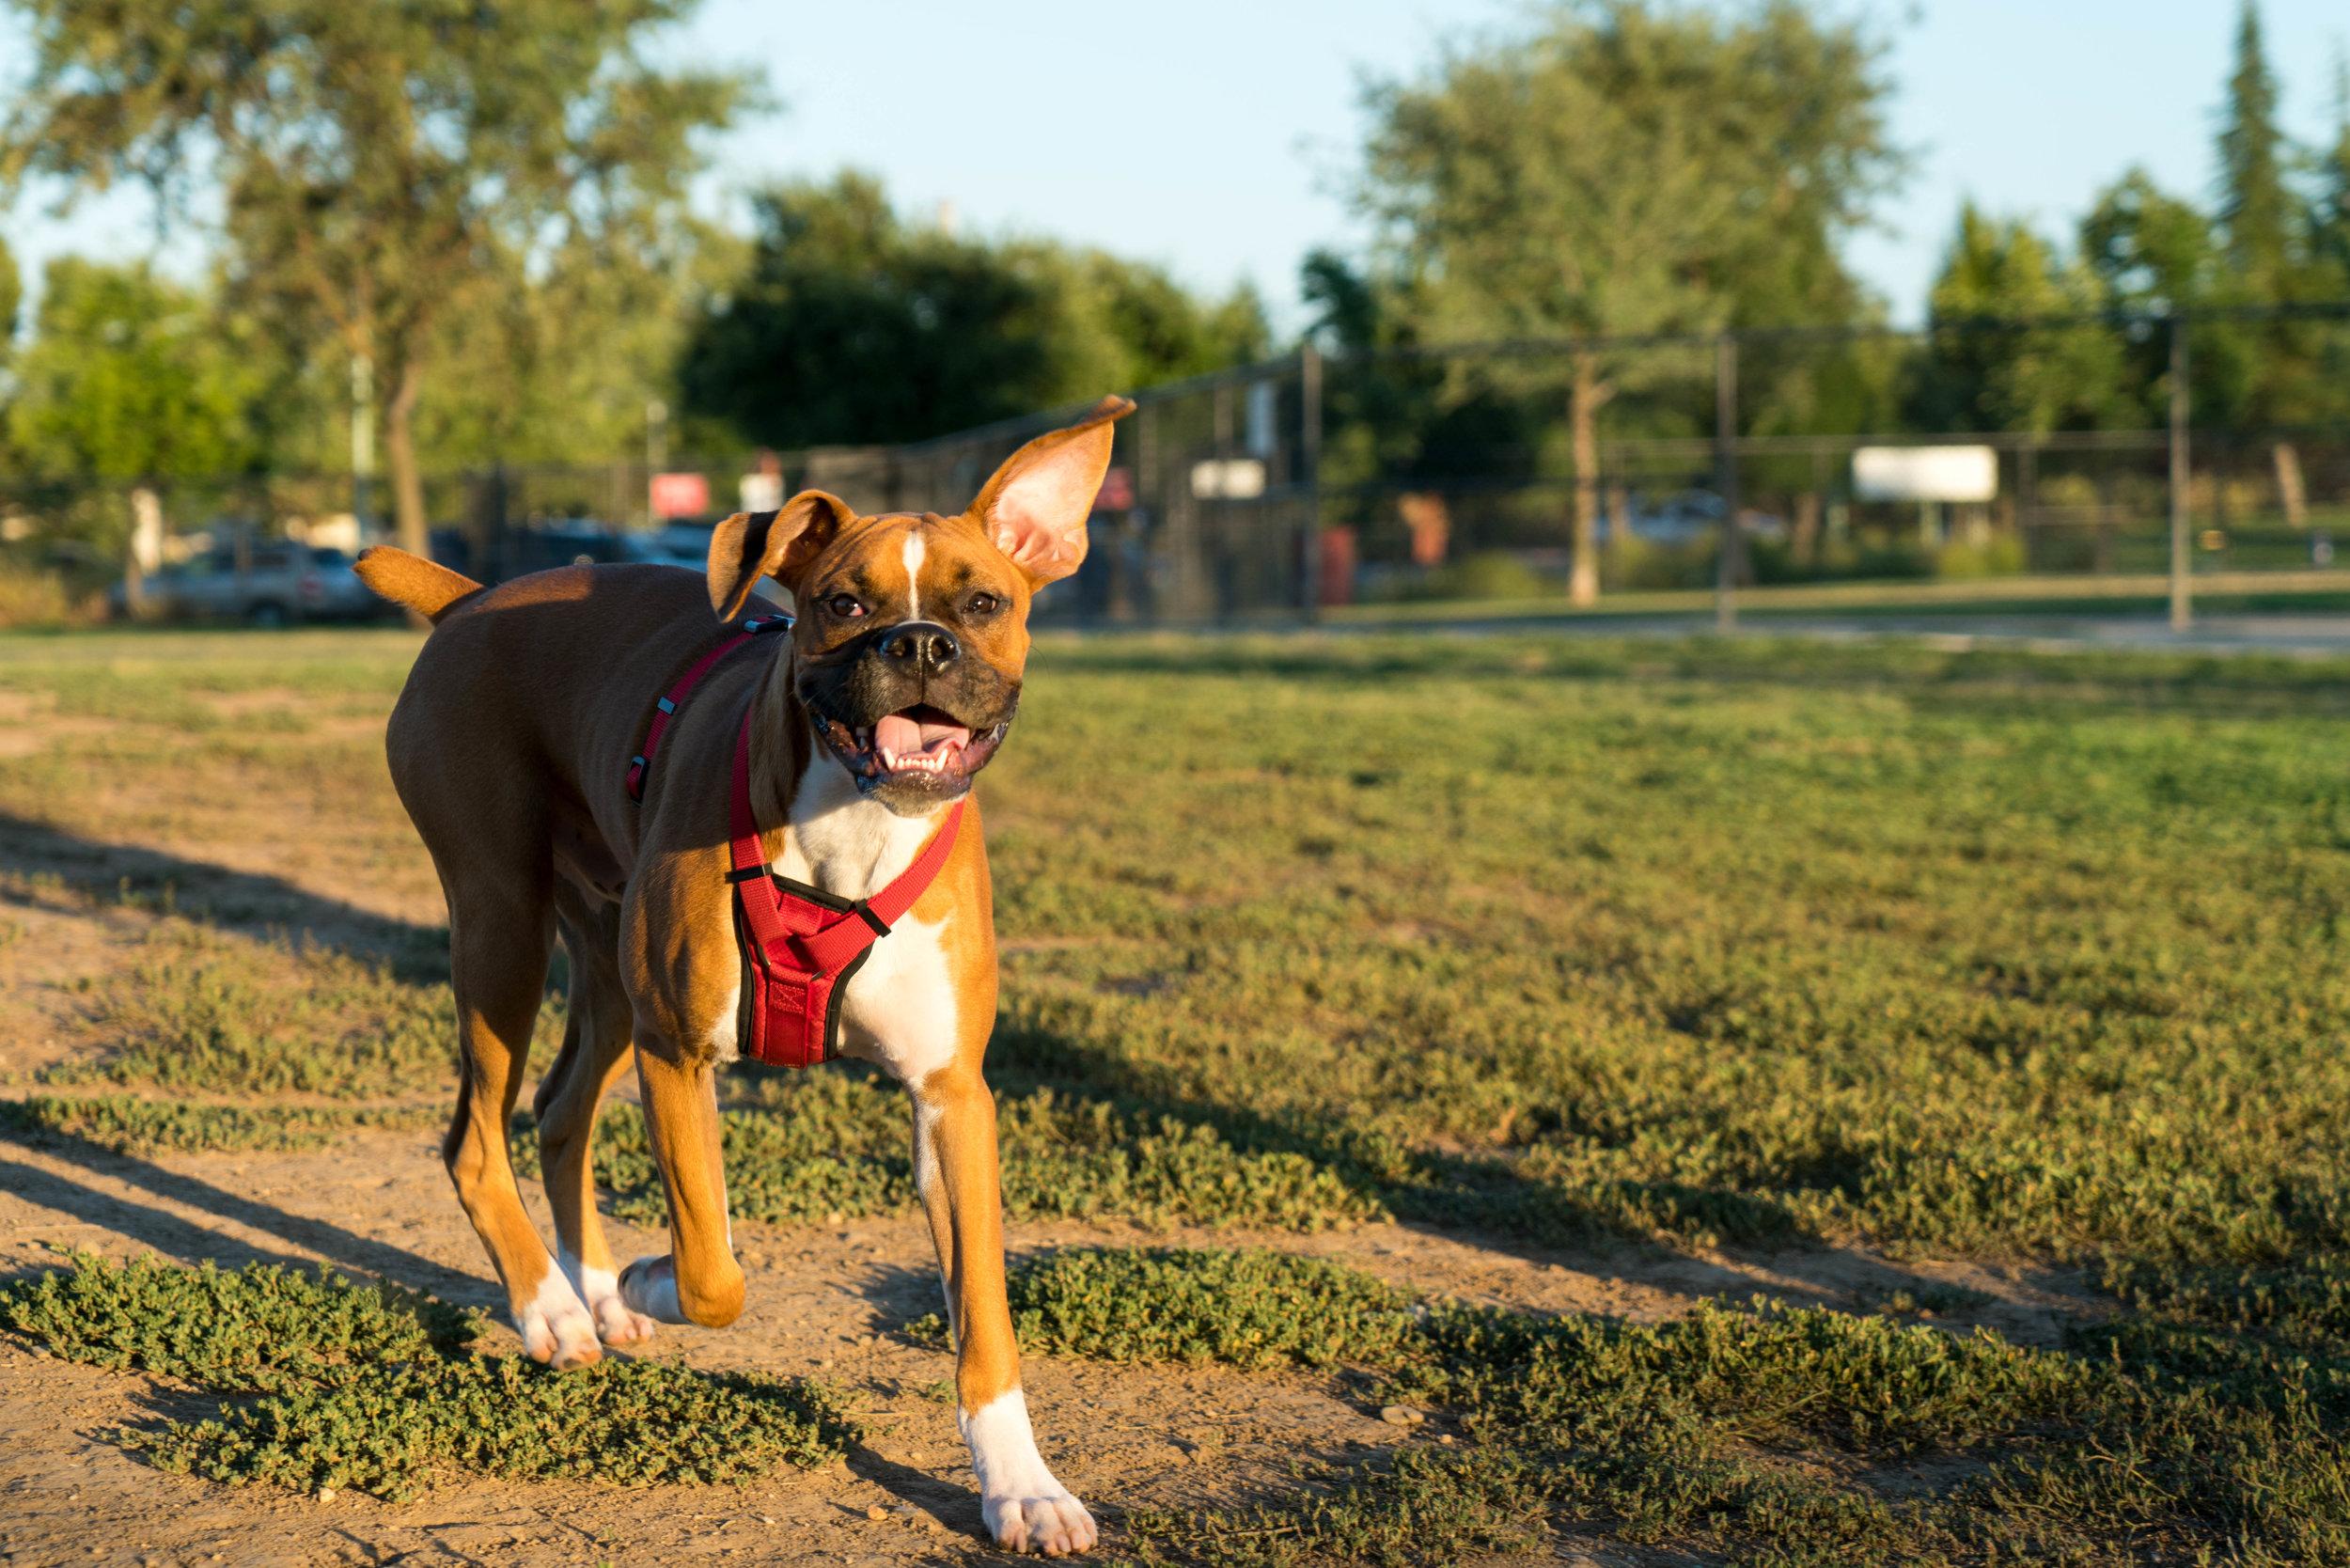 dog-park-jul-4-weekend-28.jpg